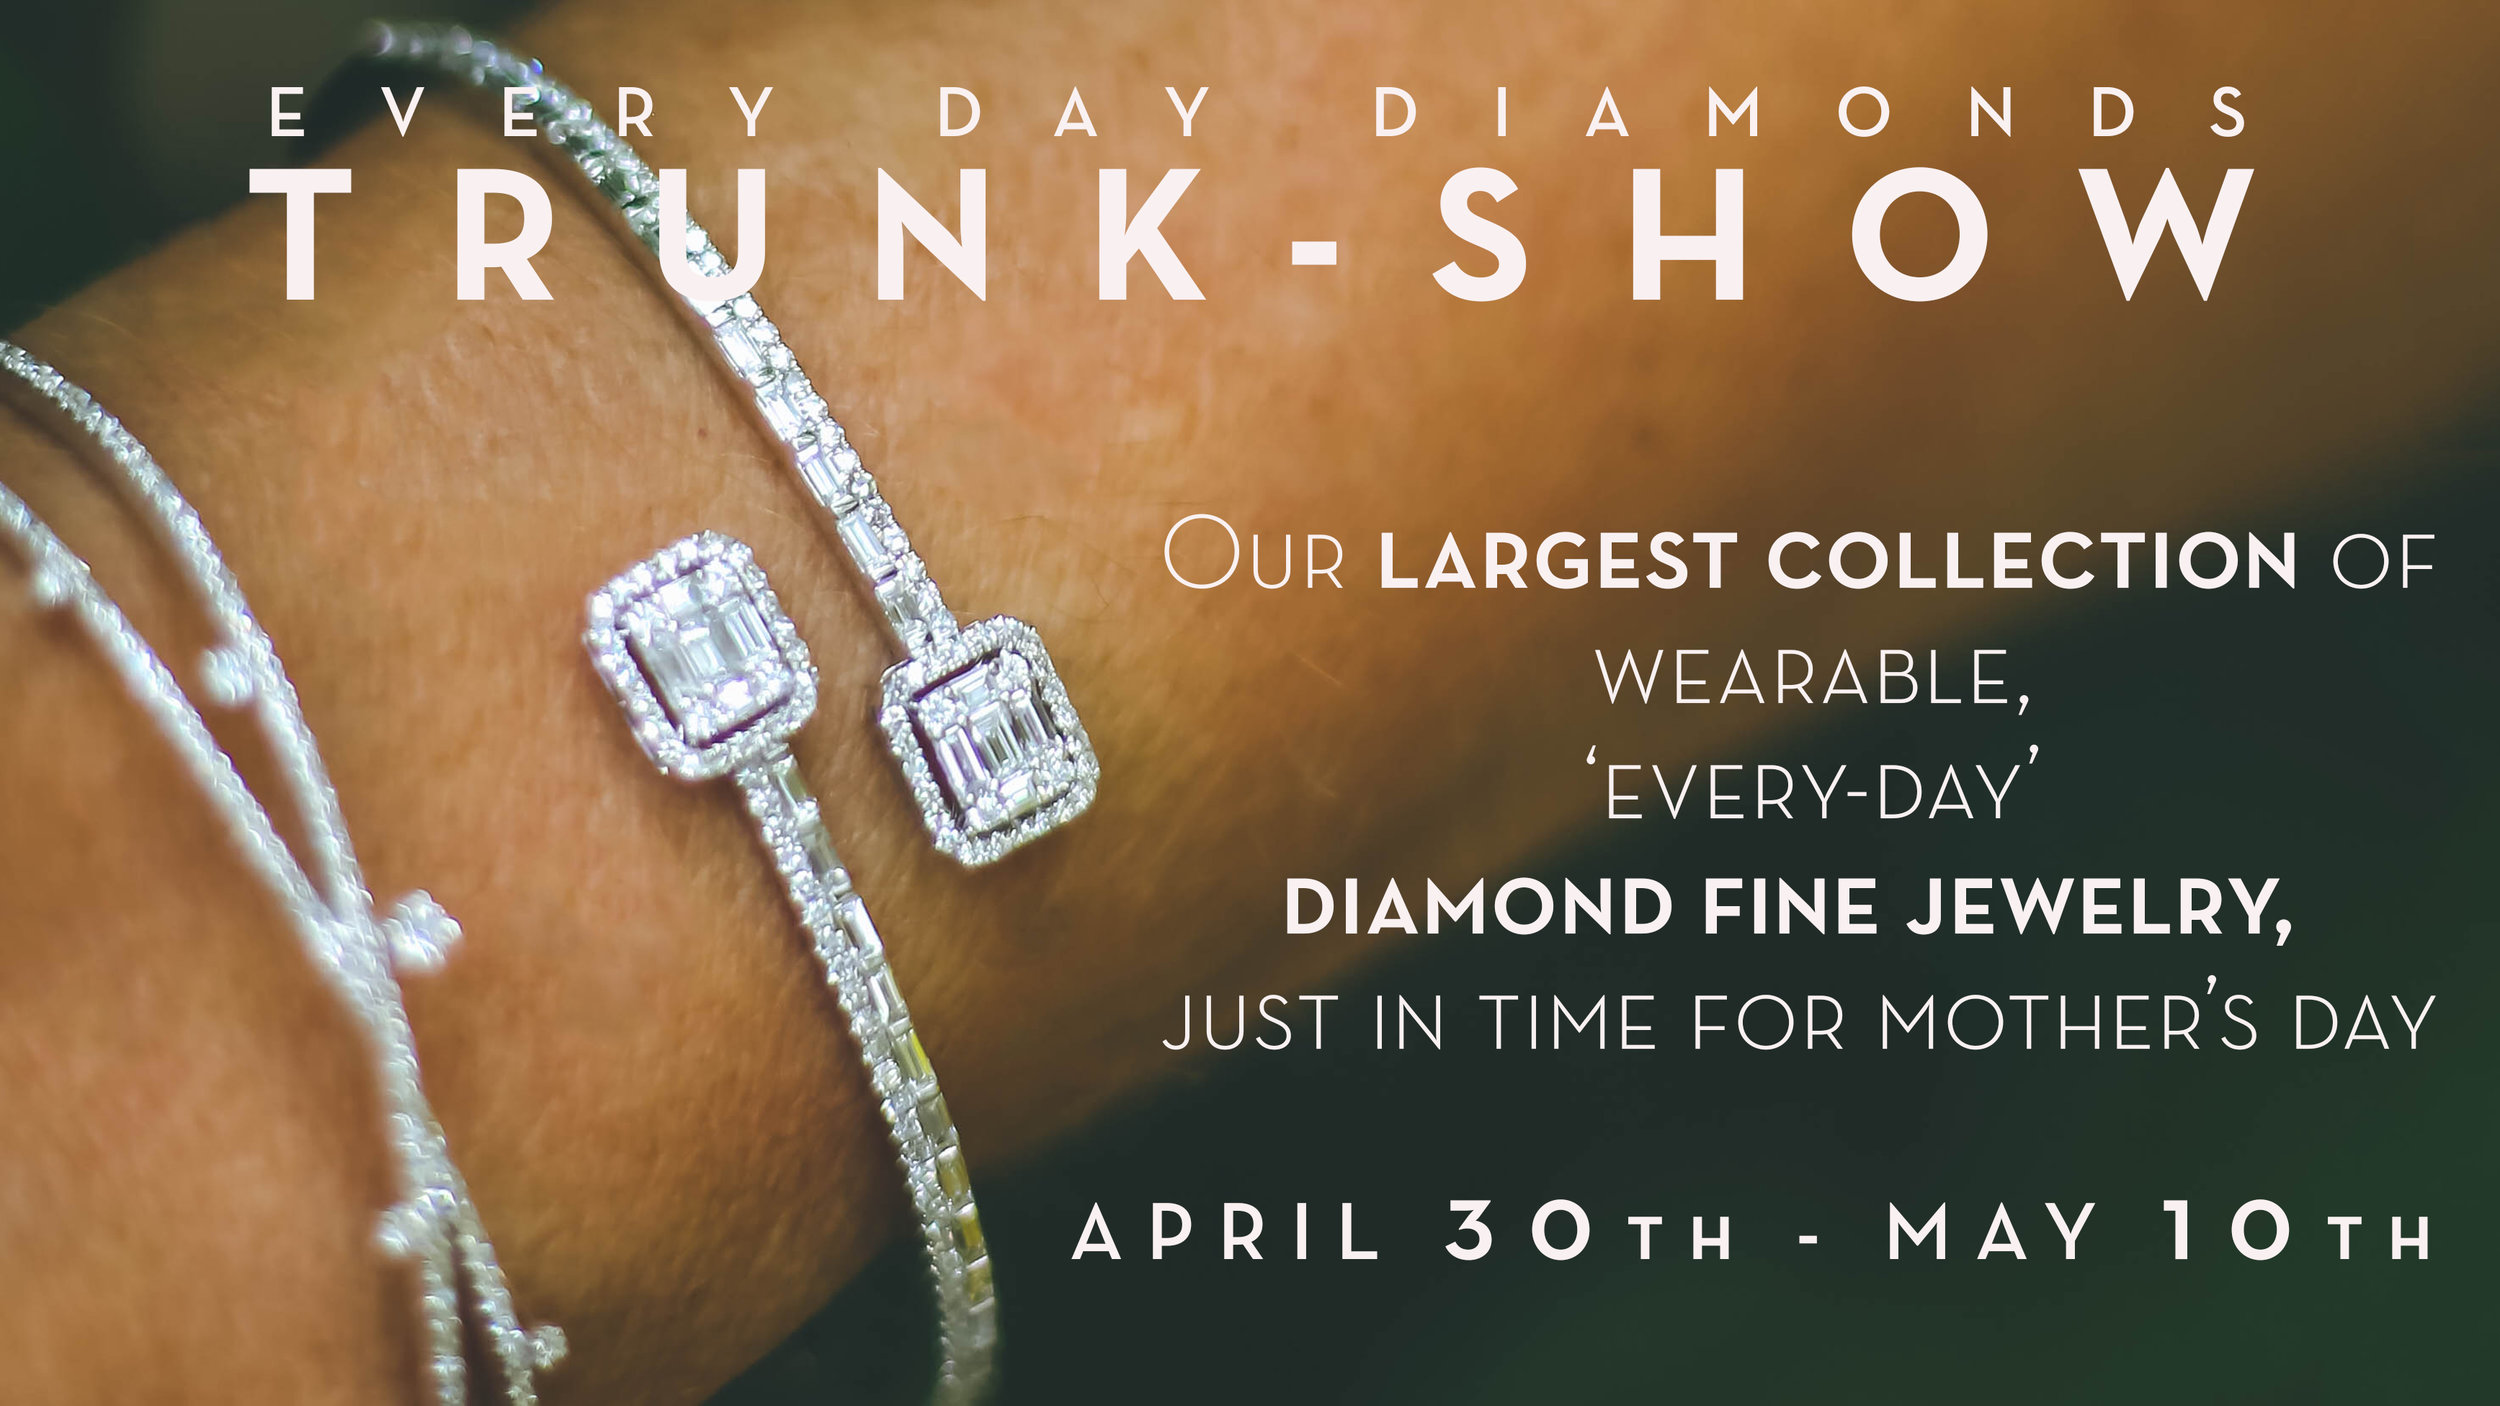 Every Day Diamonds Naples Florida Fine Jewelry.jpg